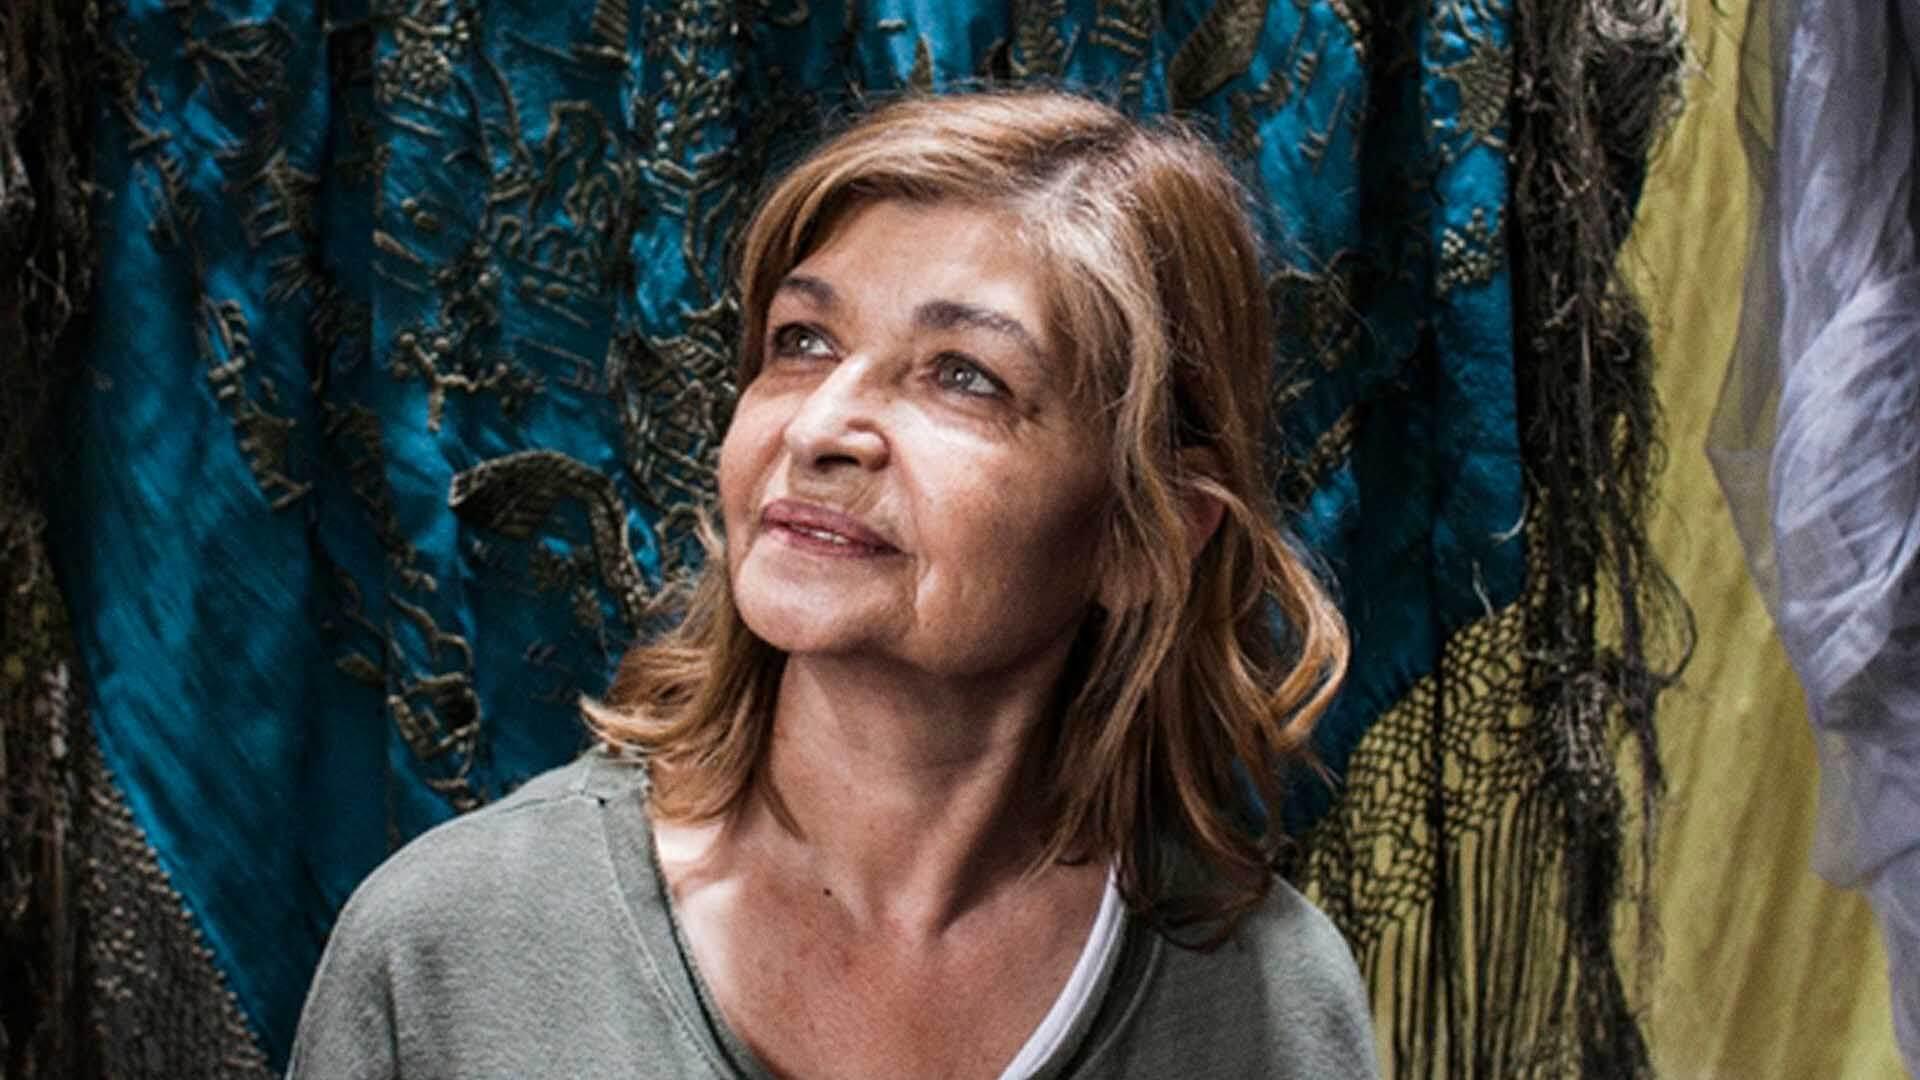 María Calderón